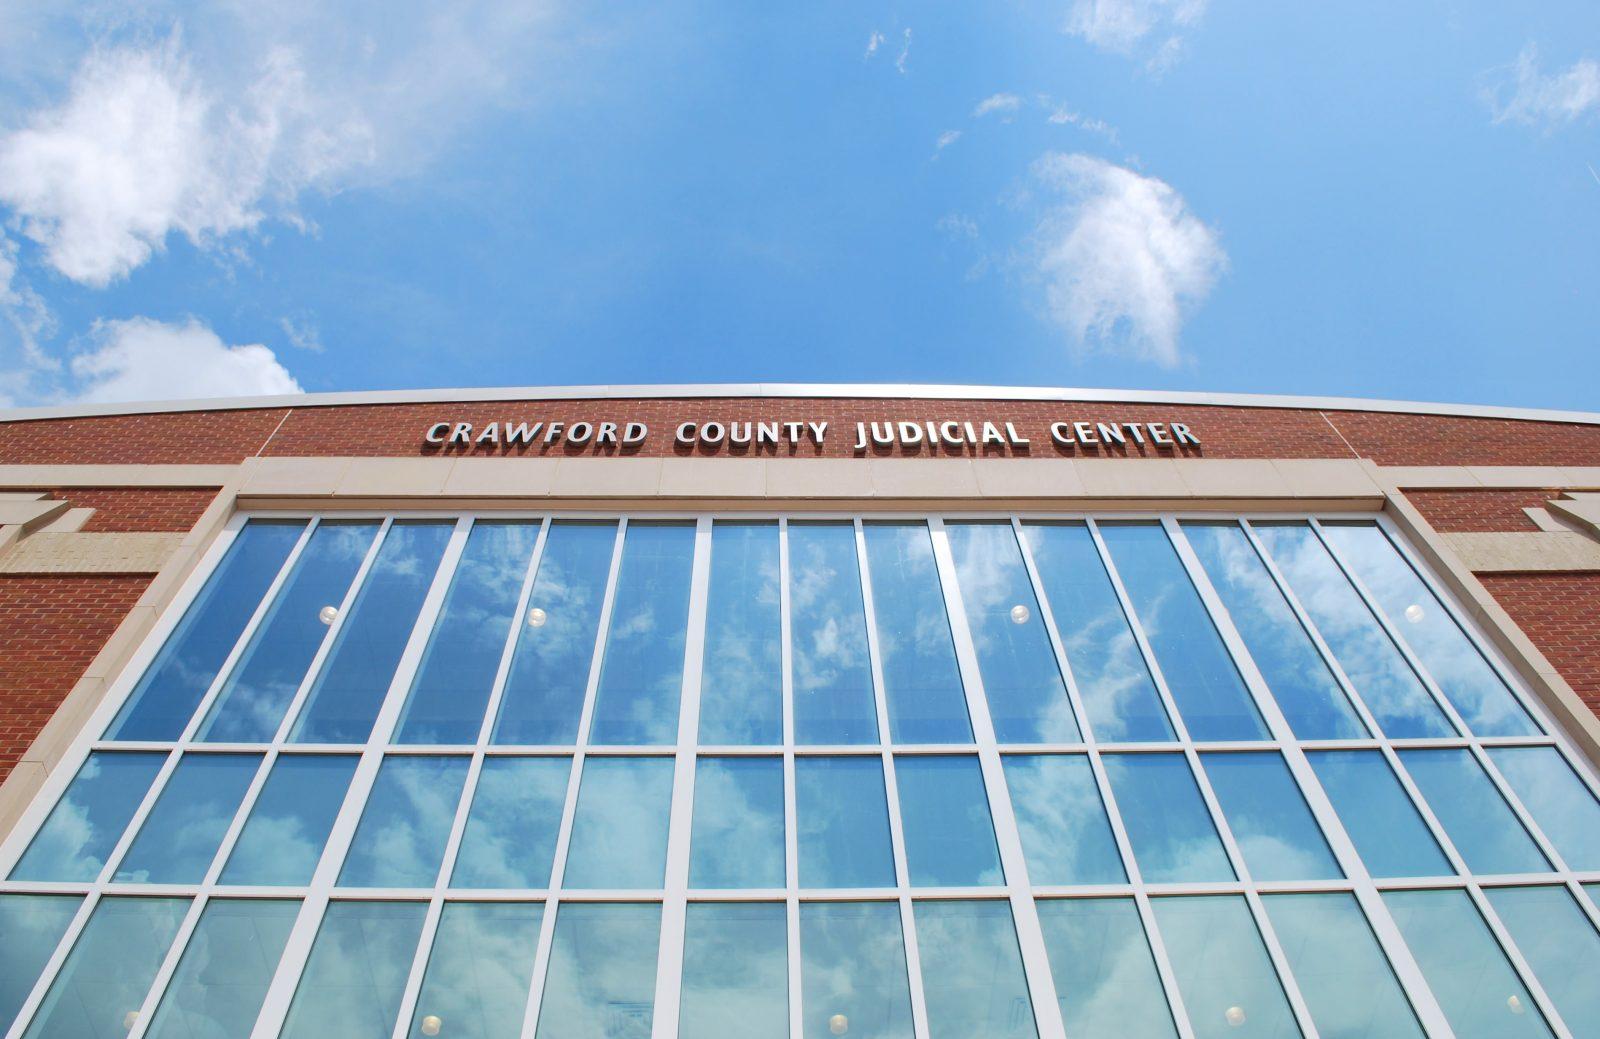 Crawford County Judicial Center